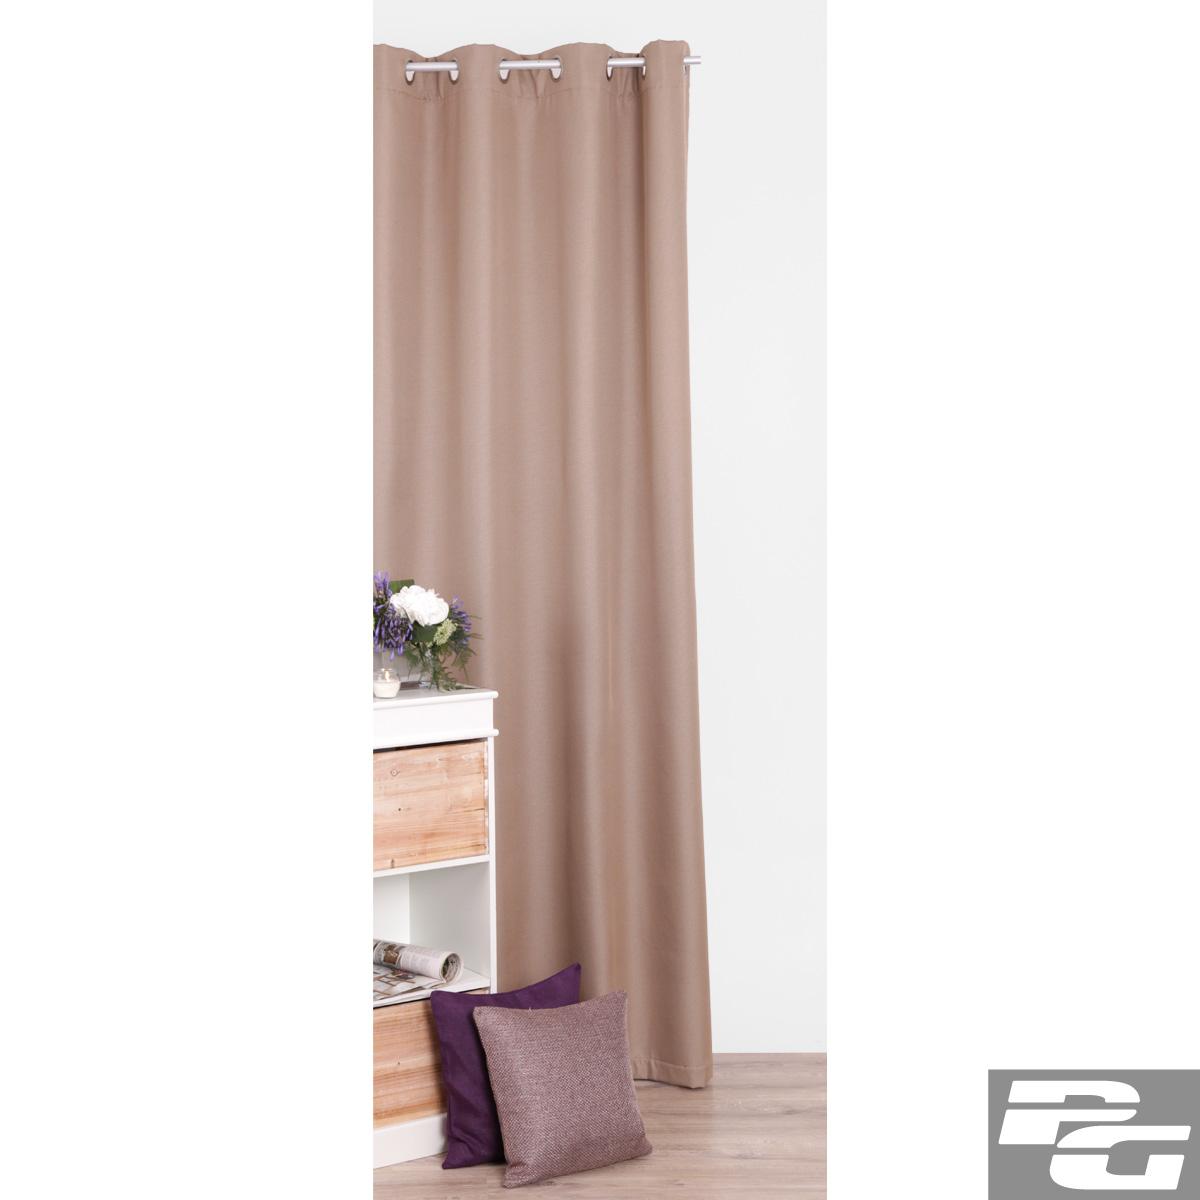 Vorhang Kinderzimmer Blickdicht :  Verdunklungsgardine BLICKDICHT Gardine Vorhang Schal mit Ösen  eBay